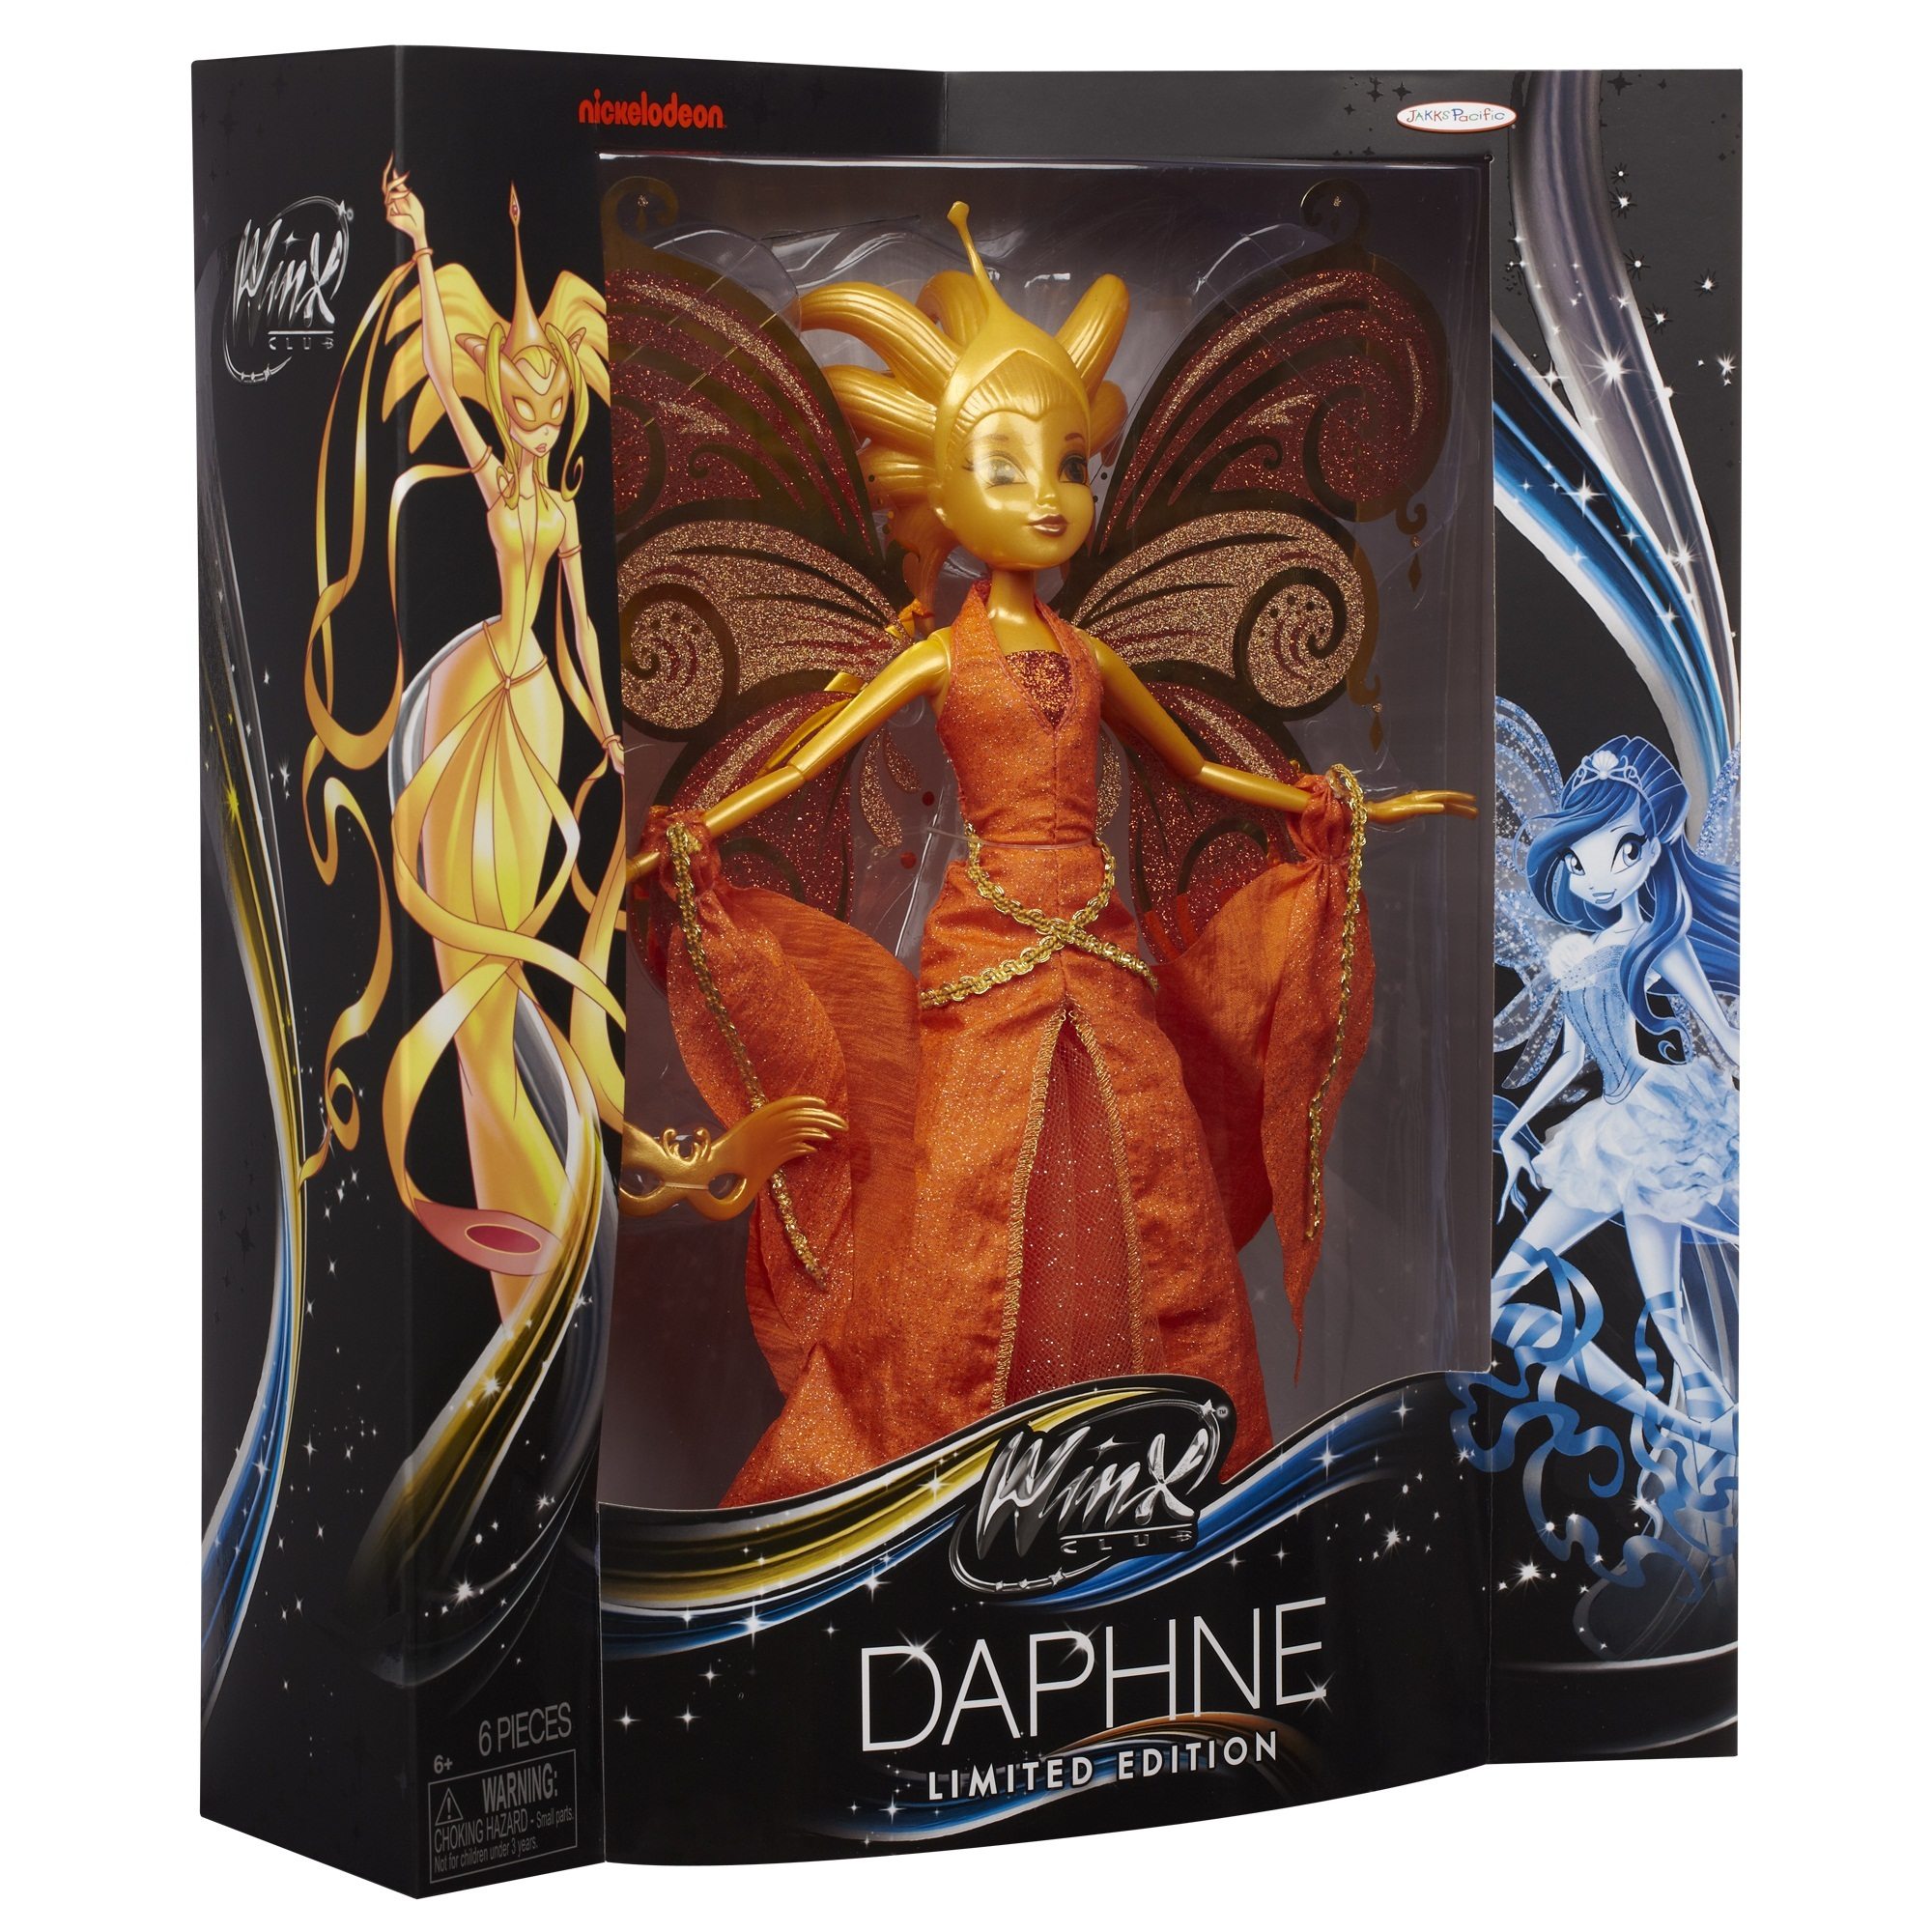 Daphne Limited Edition